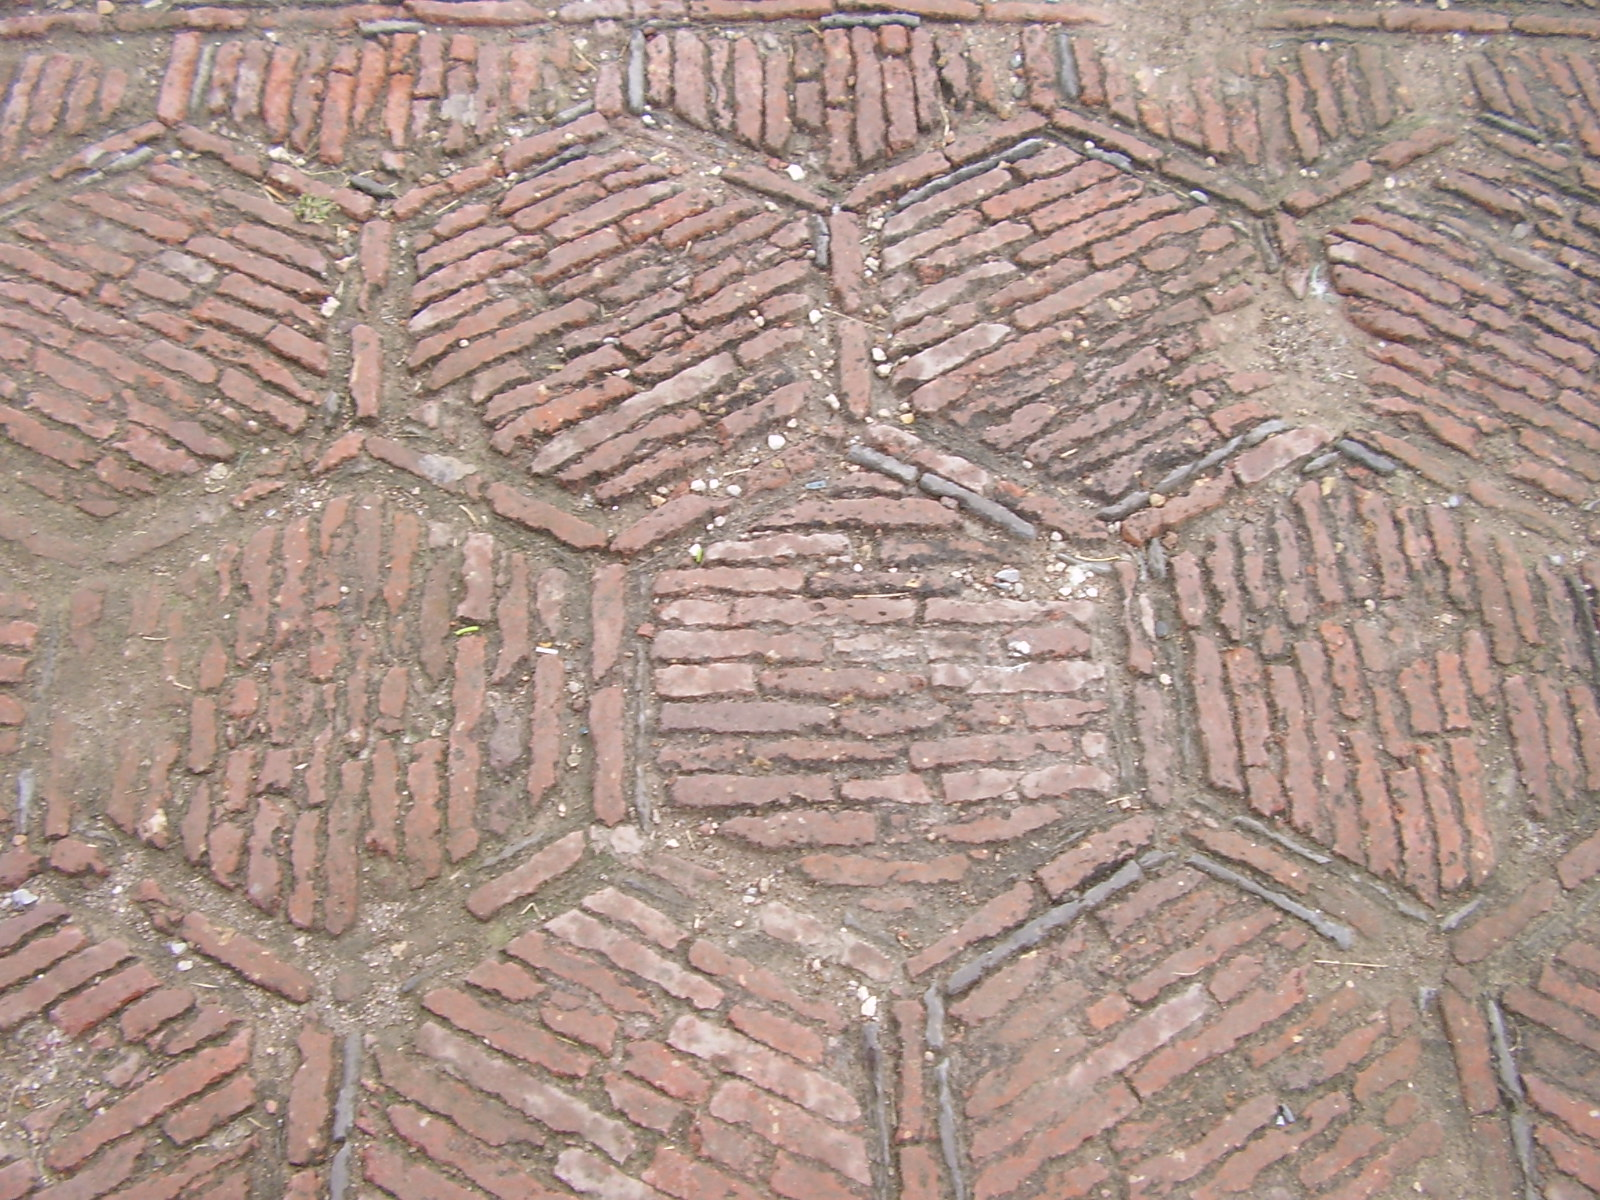 Mosaic Tile As Interior Elements : Mosaic Tile As Interior Elements : File:Tile mosaic of the interior ...